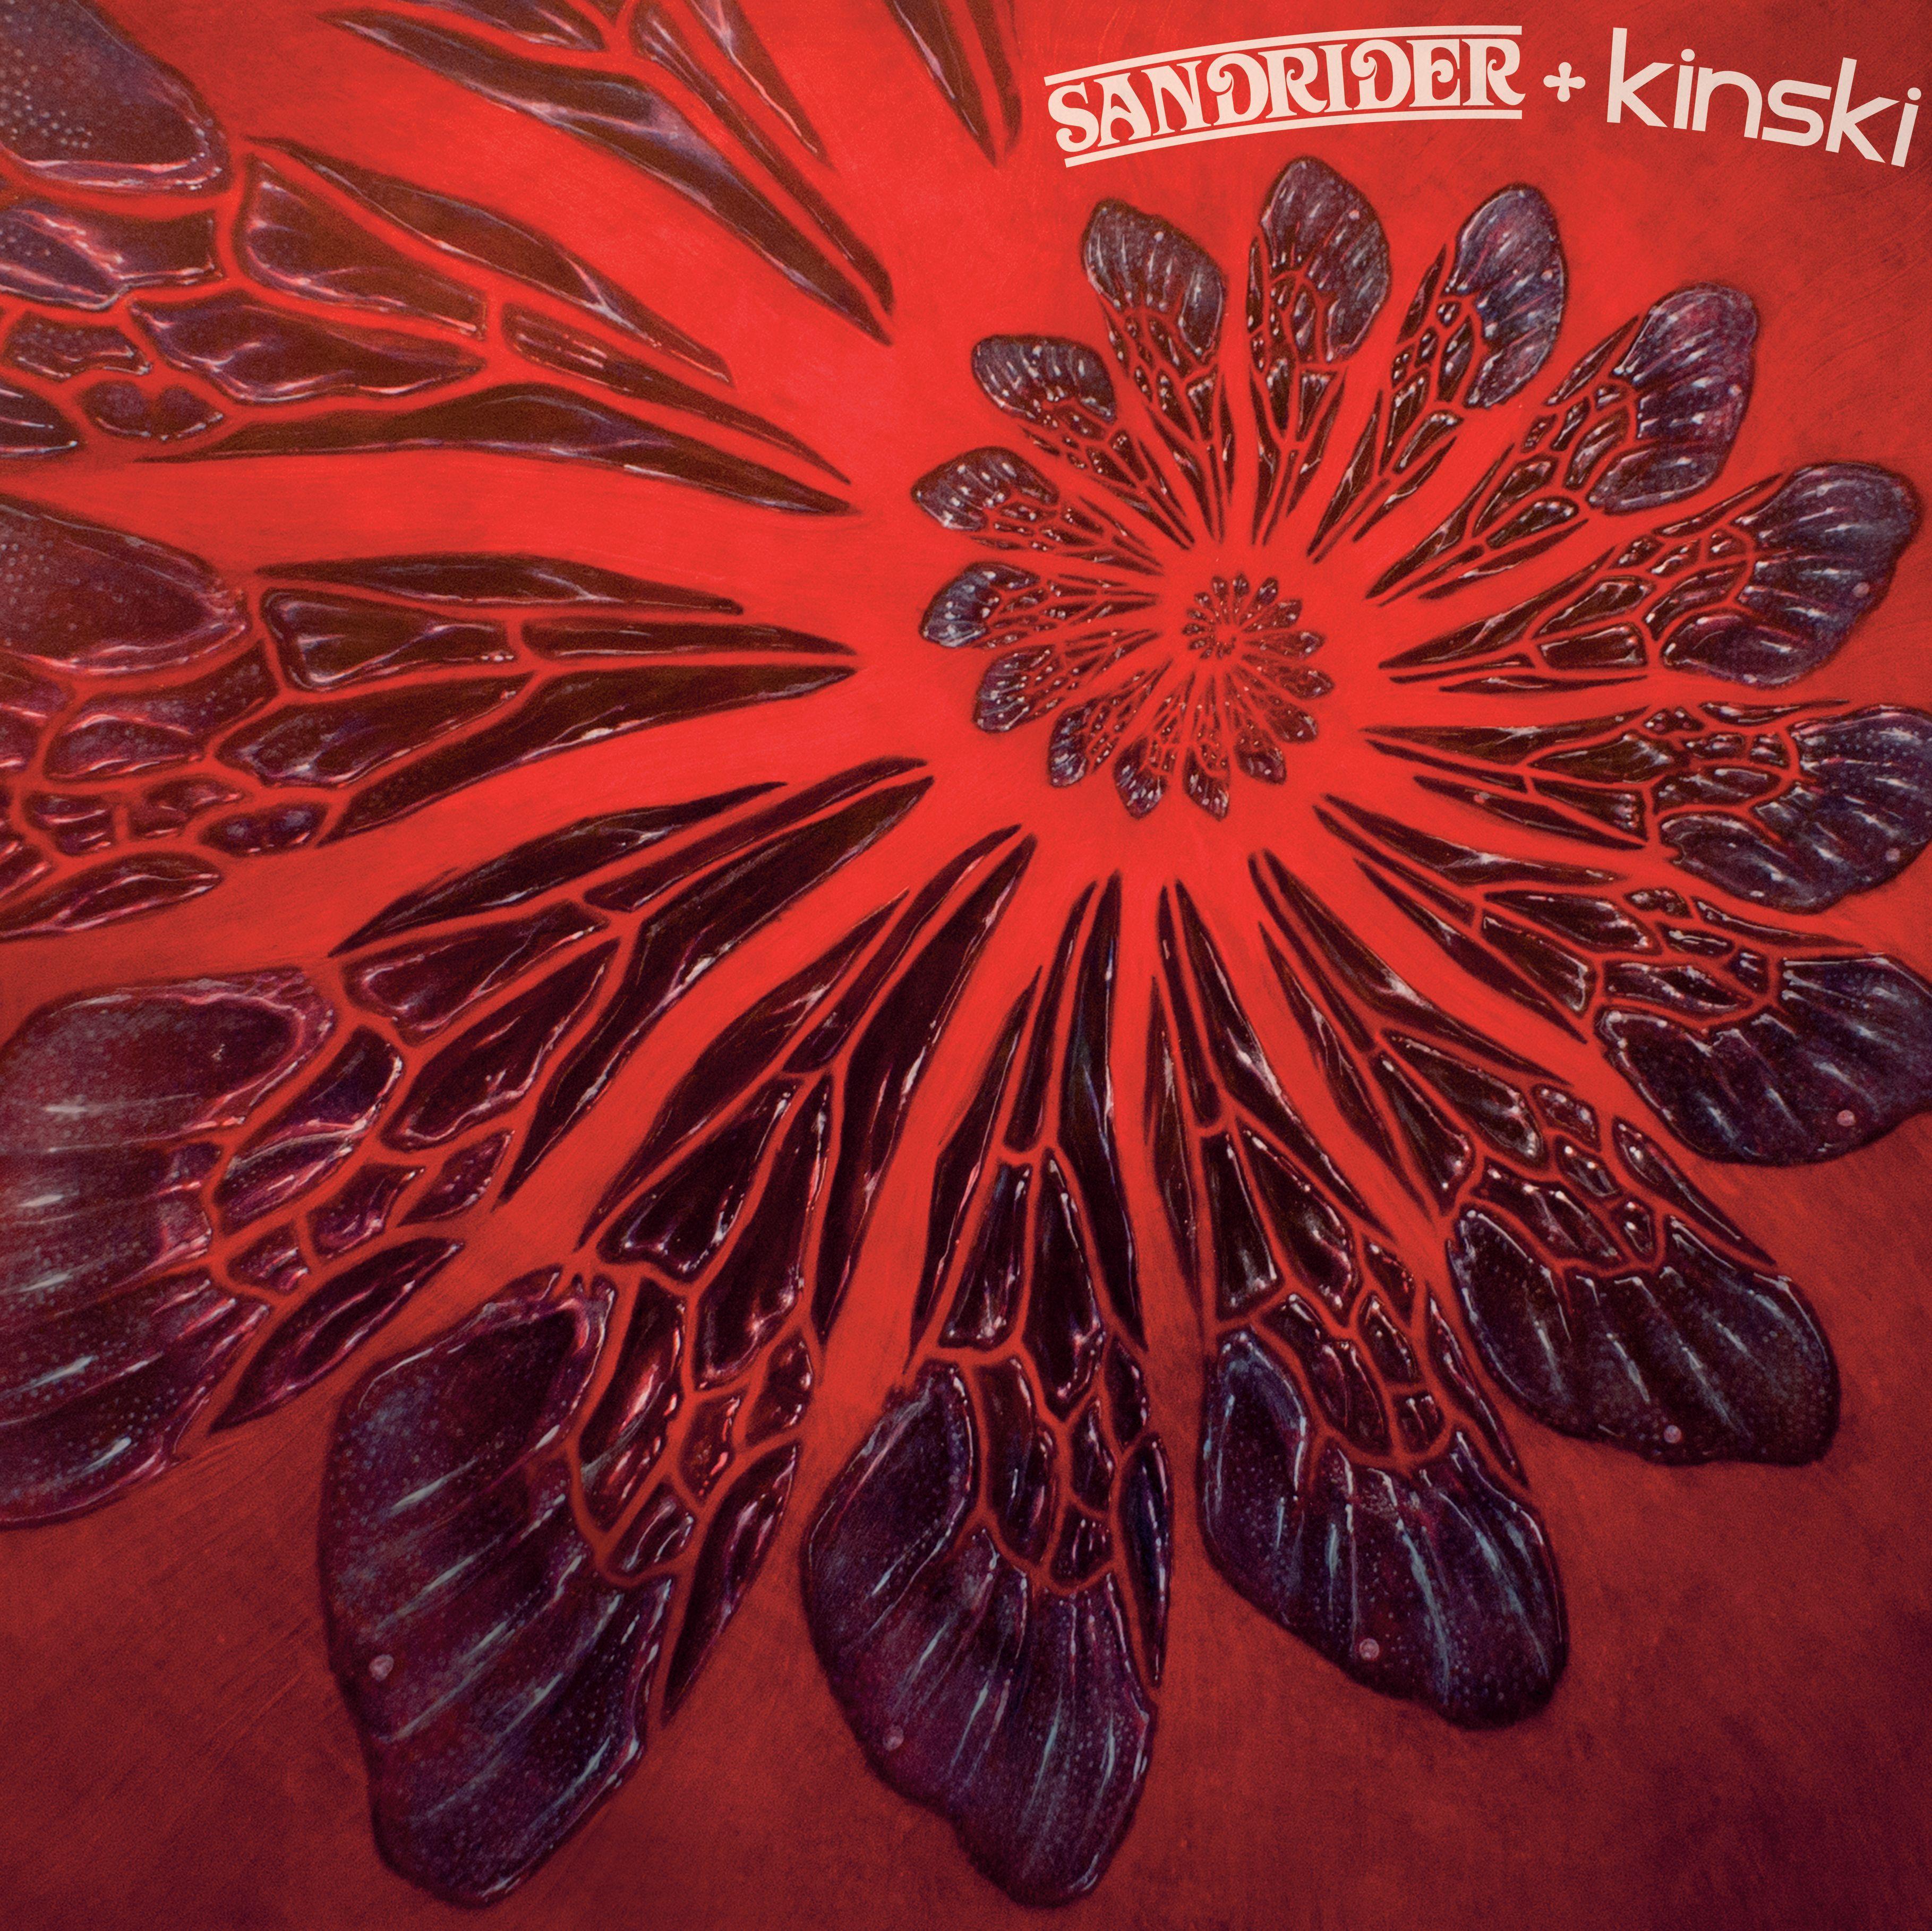 sandrider + kinski Google Search Music, Album art